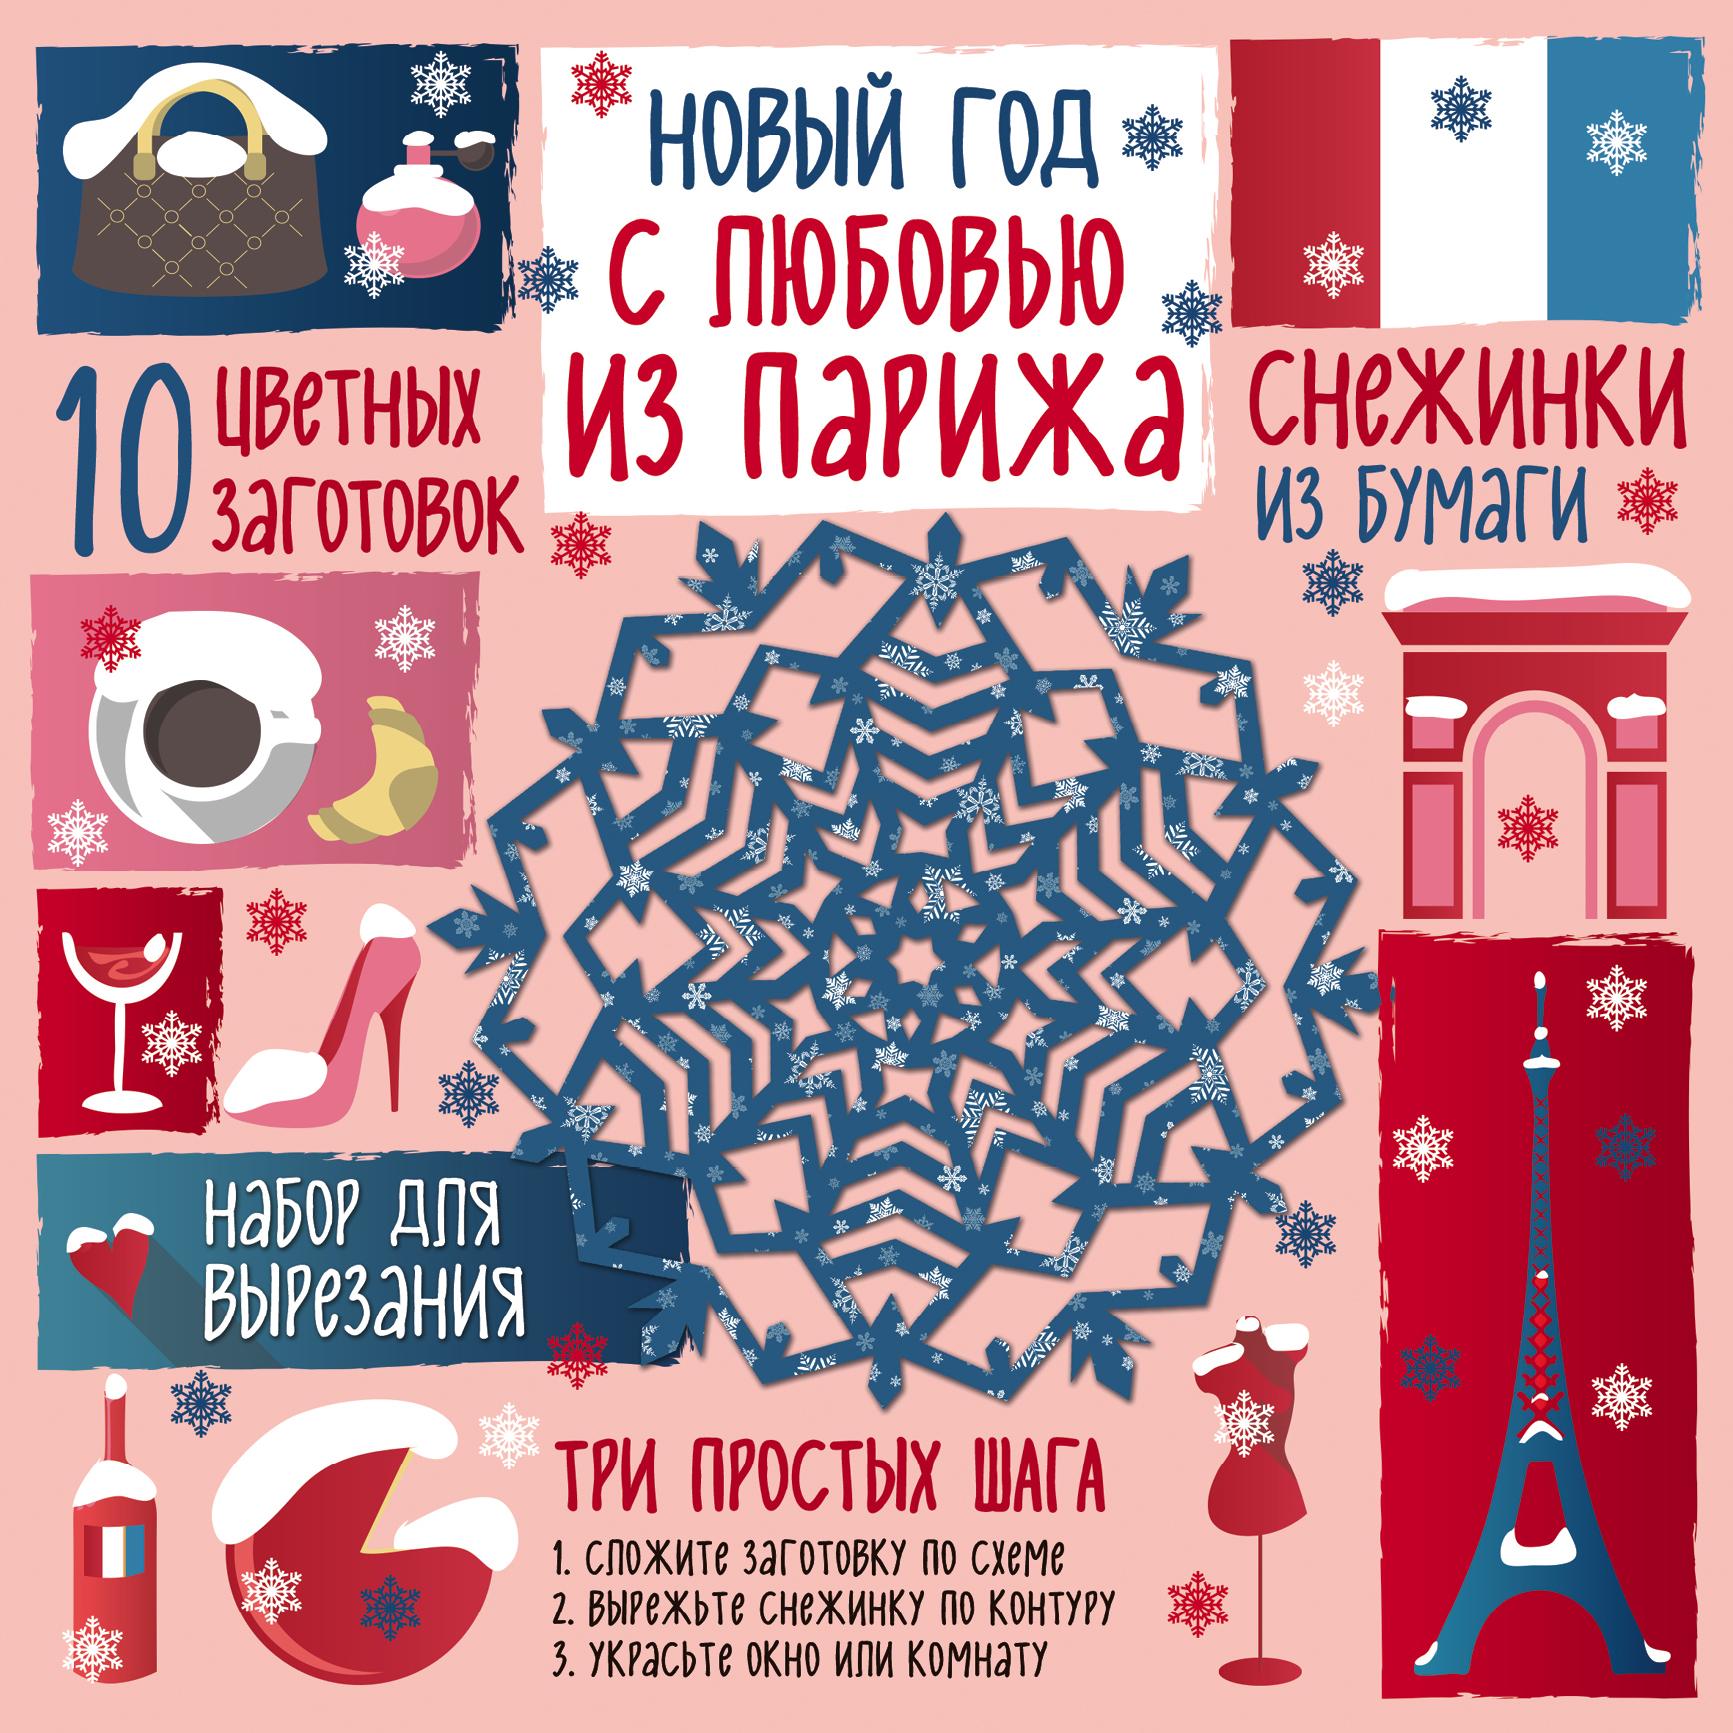 Зайцева А.А. Снежинки из бумаги. Новый год С любовью из Парижа